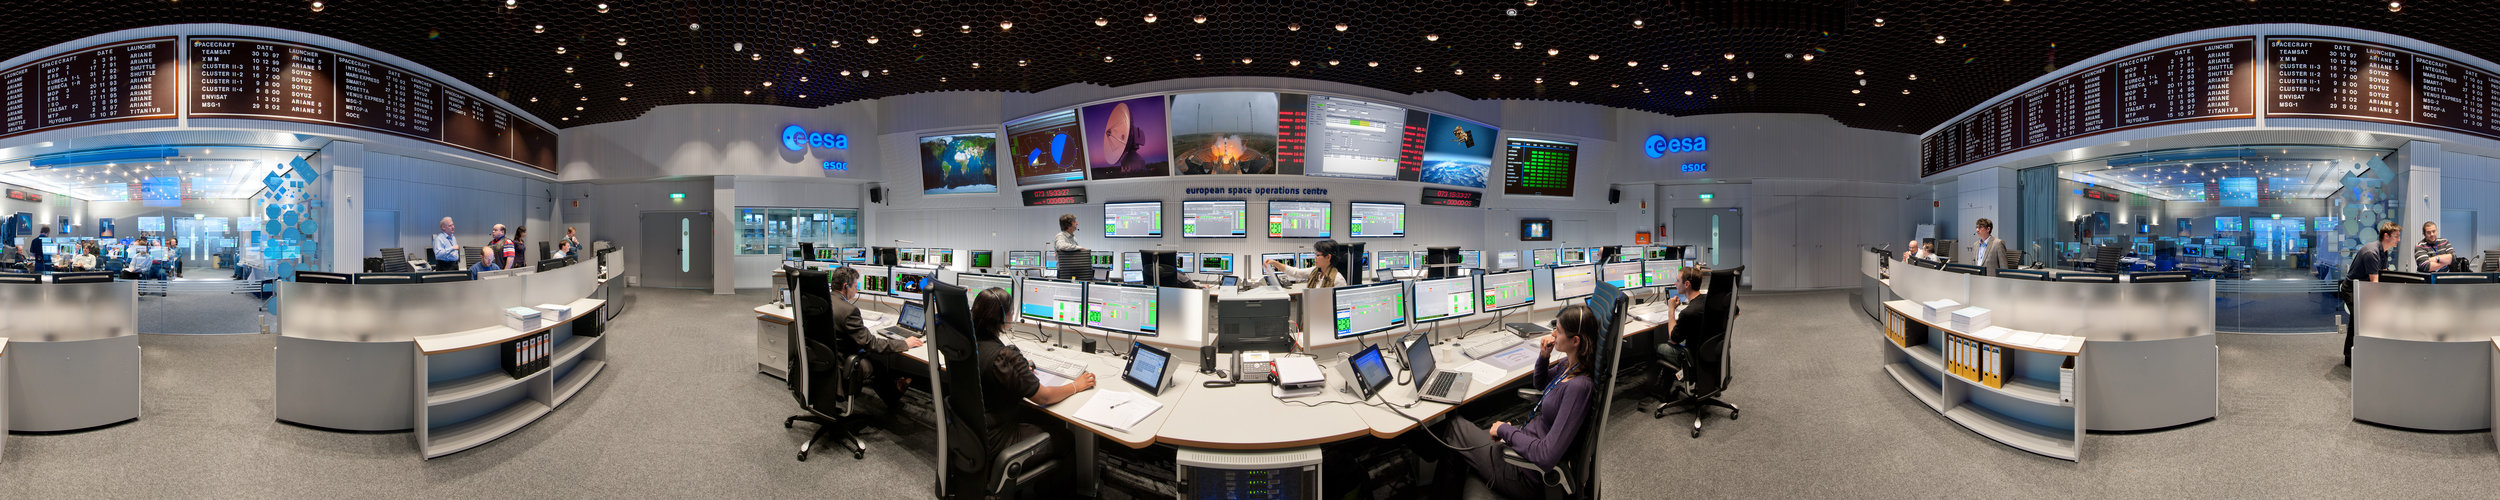 ESA Main Control Room, Darmstadt